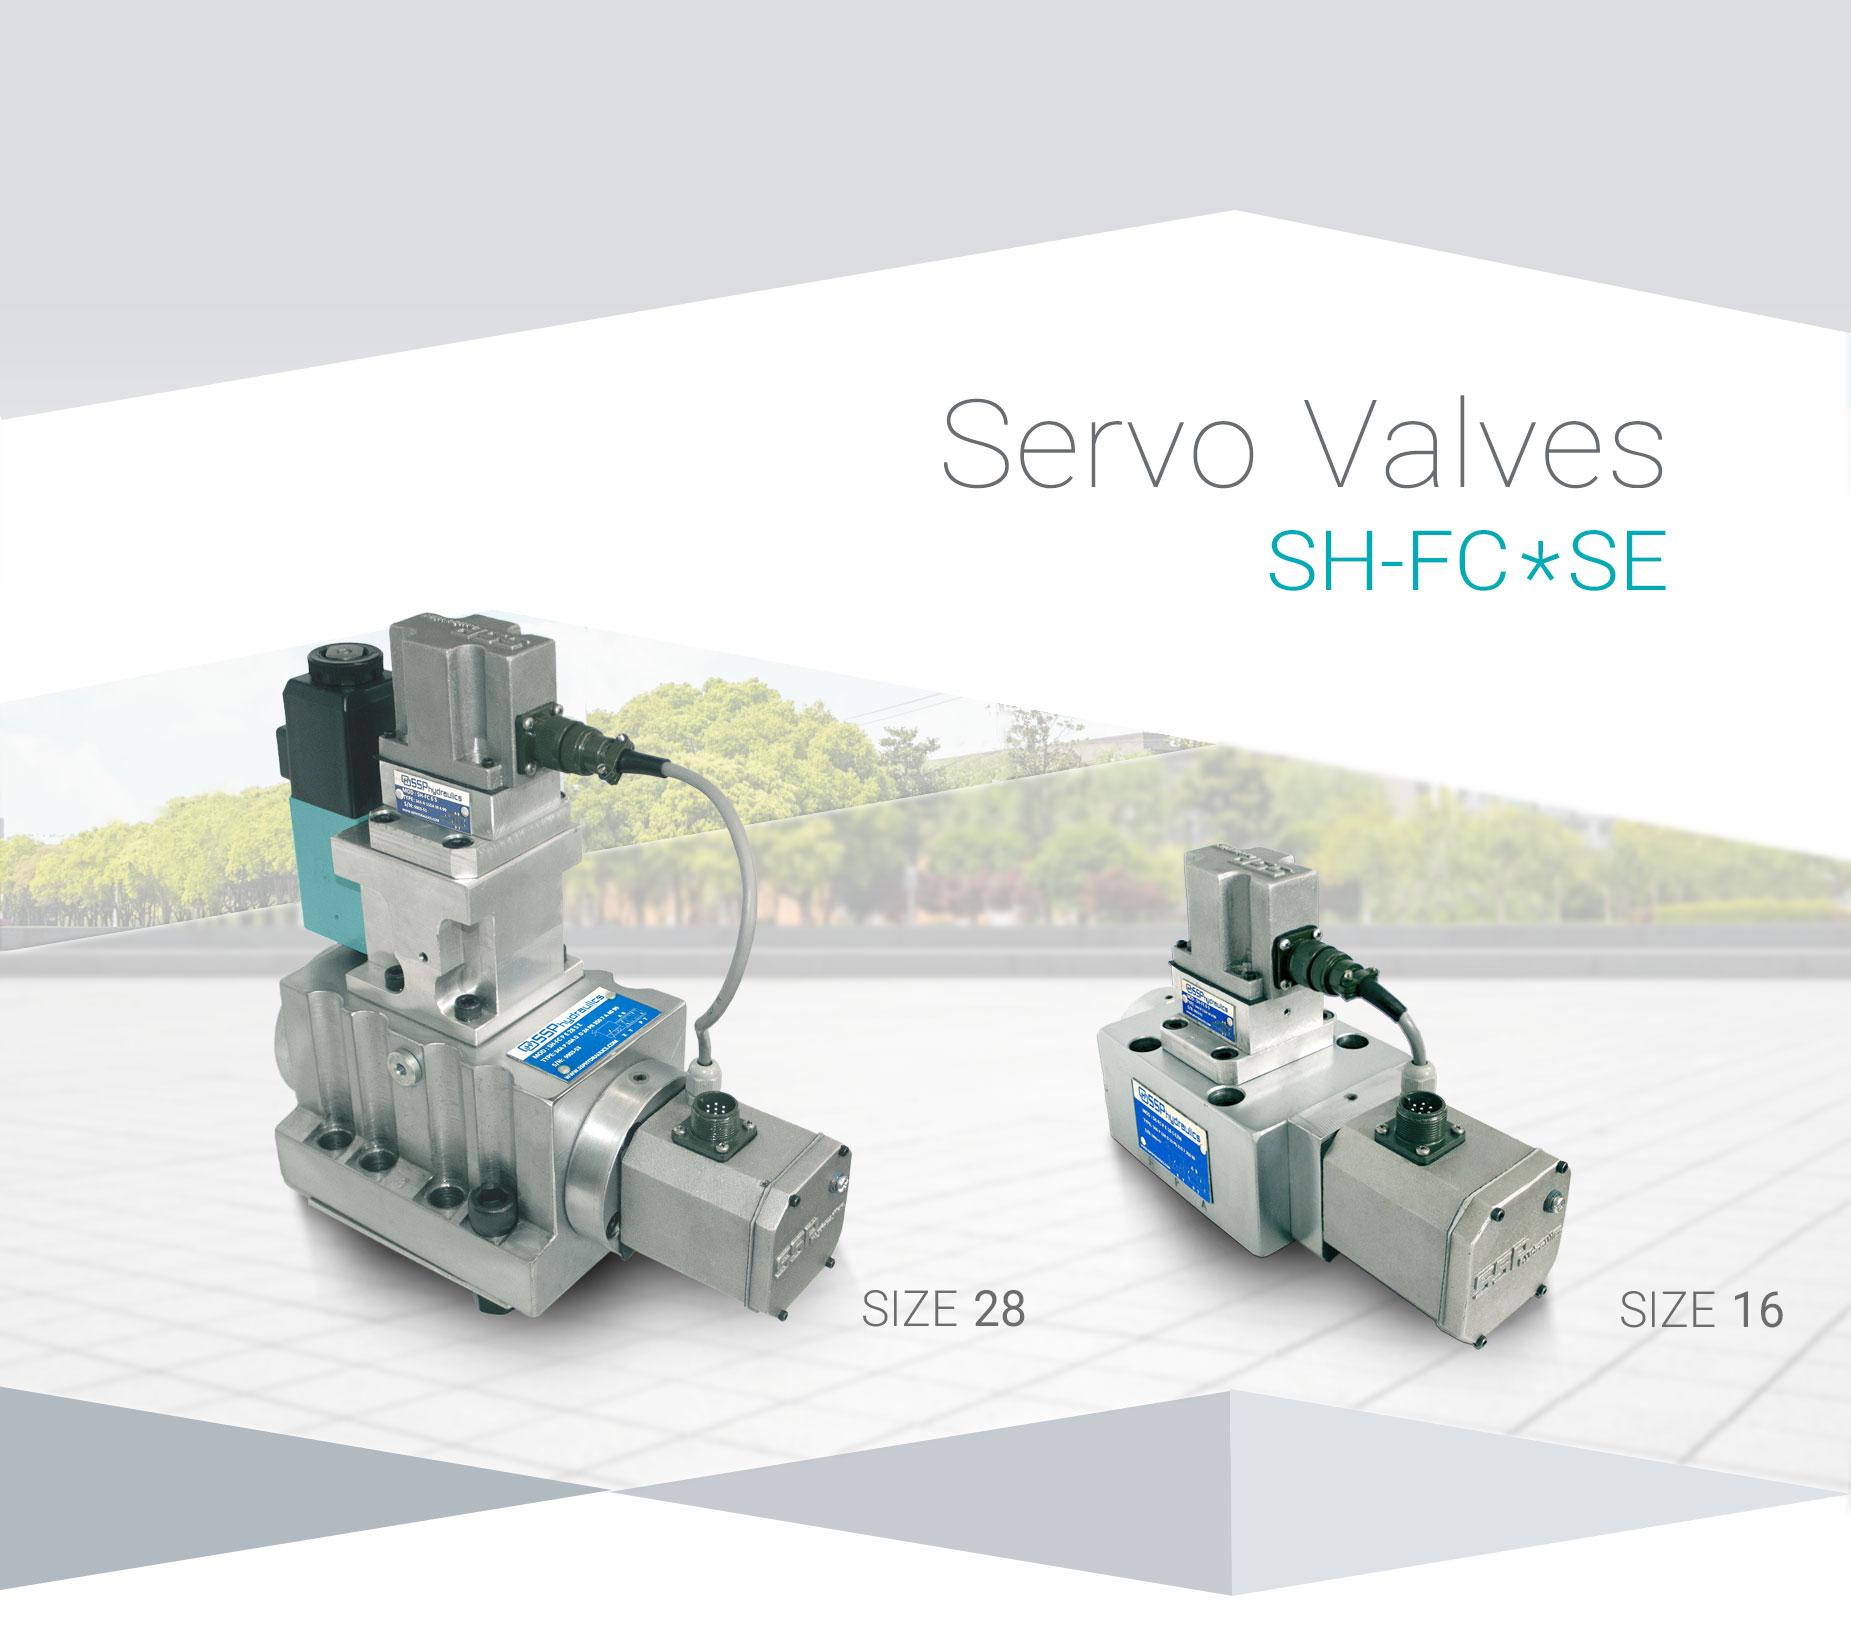 SH-FC-1628SE(1)